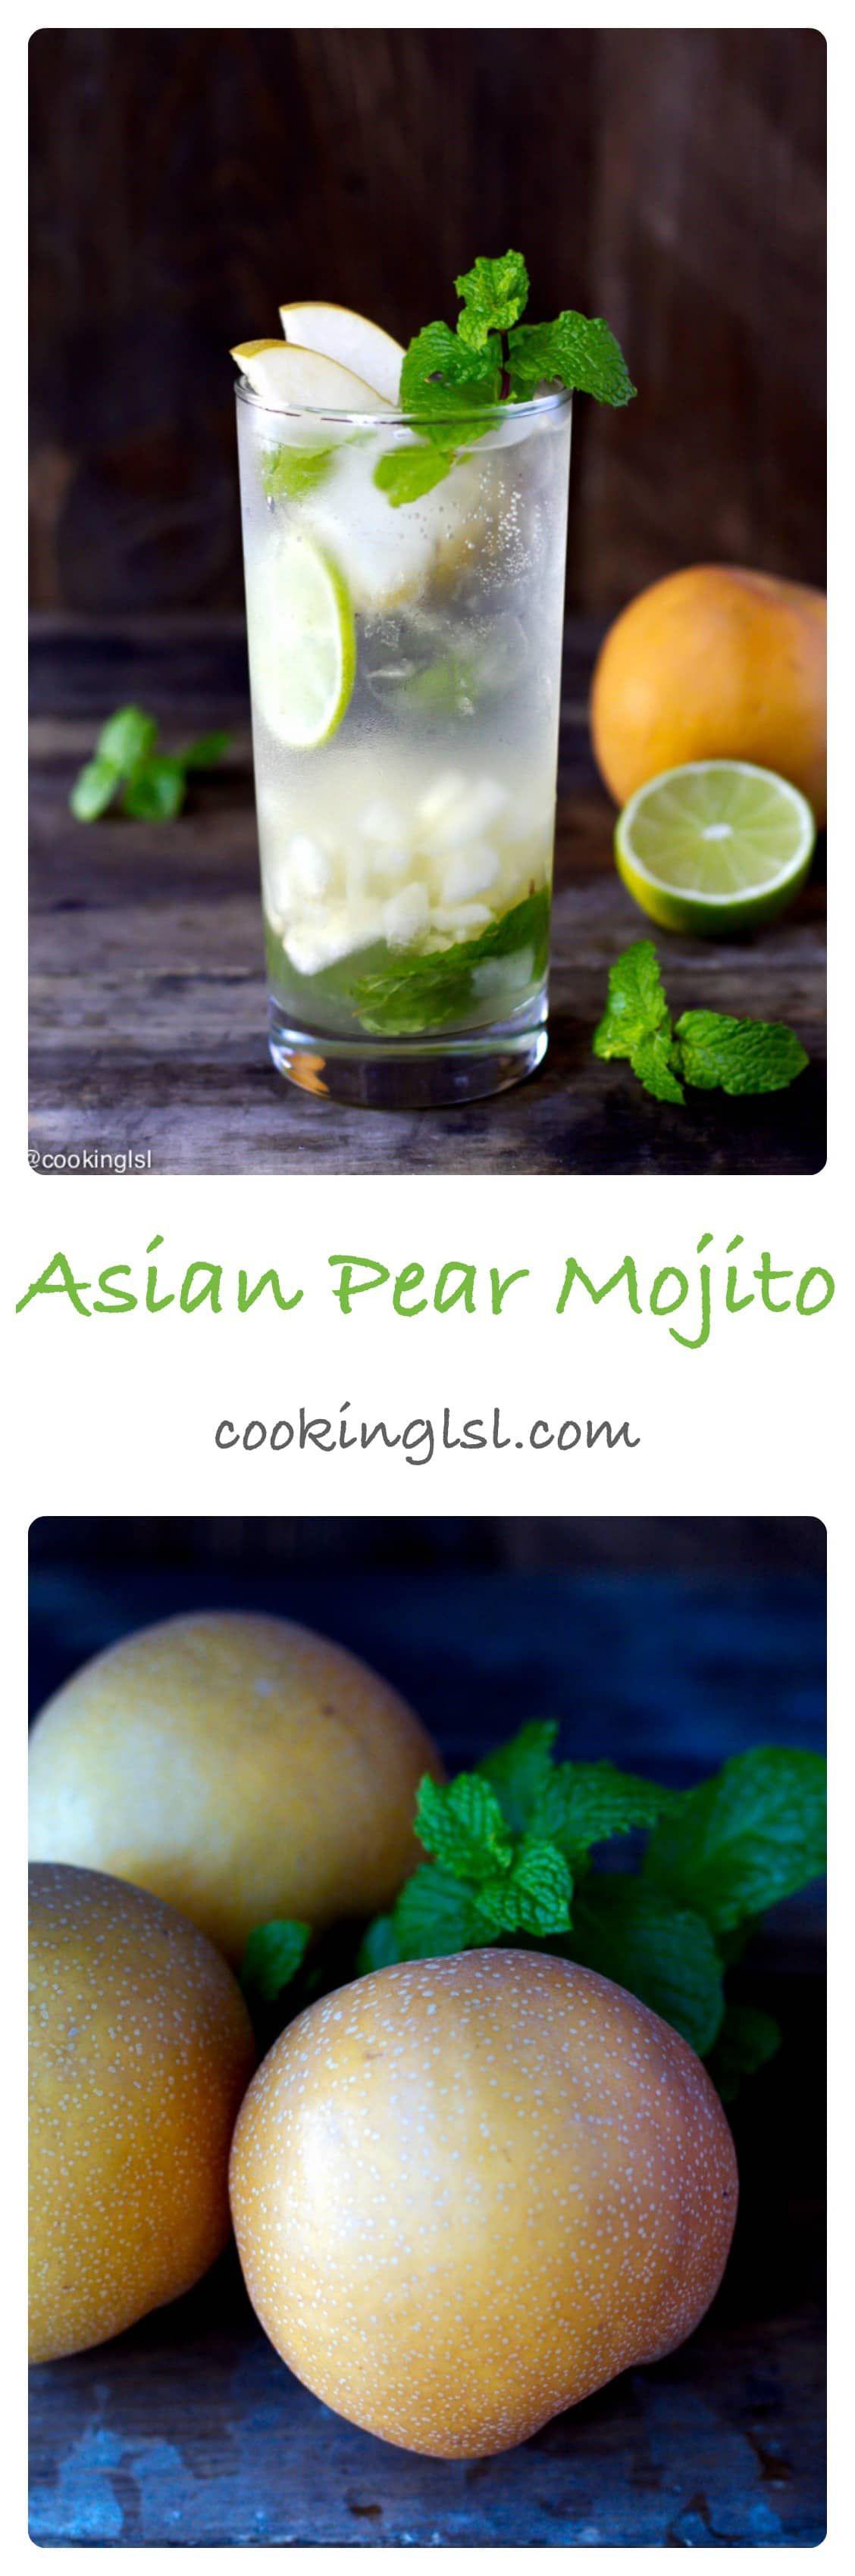 Asian Pear Mojito Recipe #simplecocktail